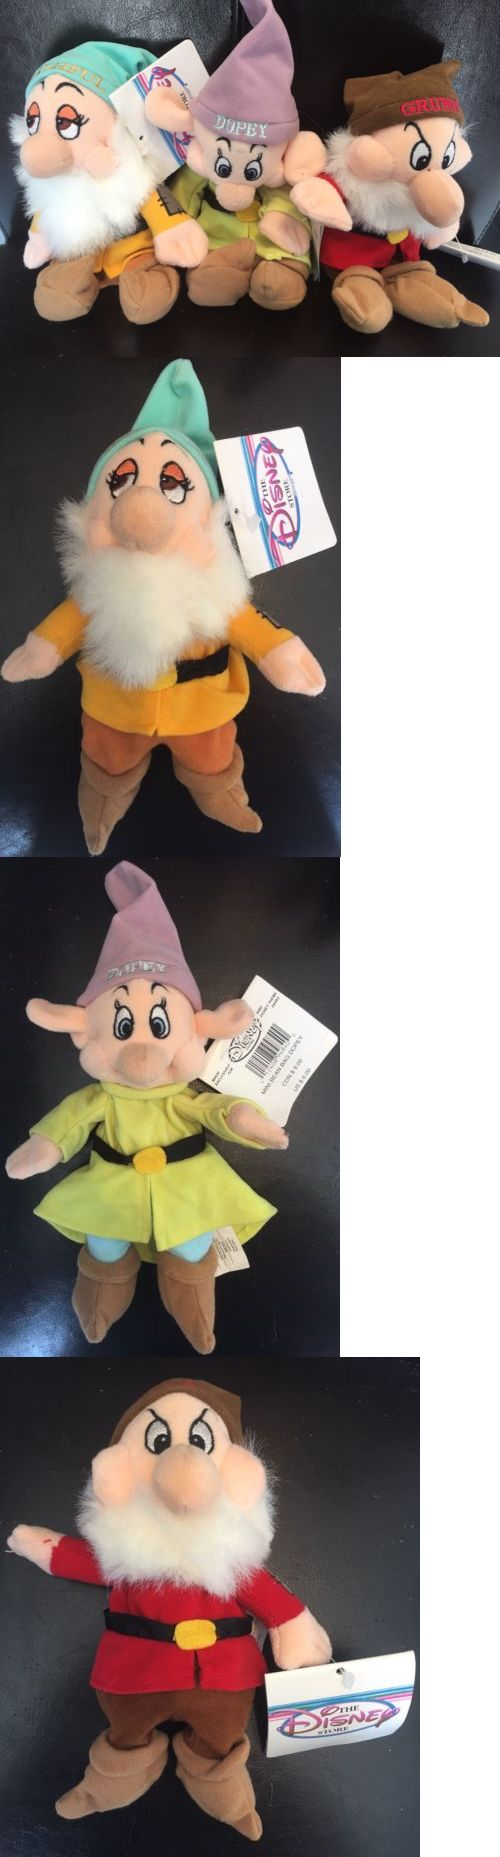 Snow White 19222: Disney Store Snow White And Seven Dwarfs Bean Bag Plush Lot Grumpy Dopey Bashful -> BUY IT NOW ONLY: $30 on eBay!